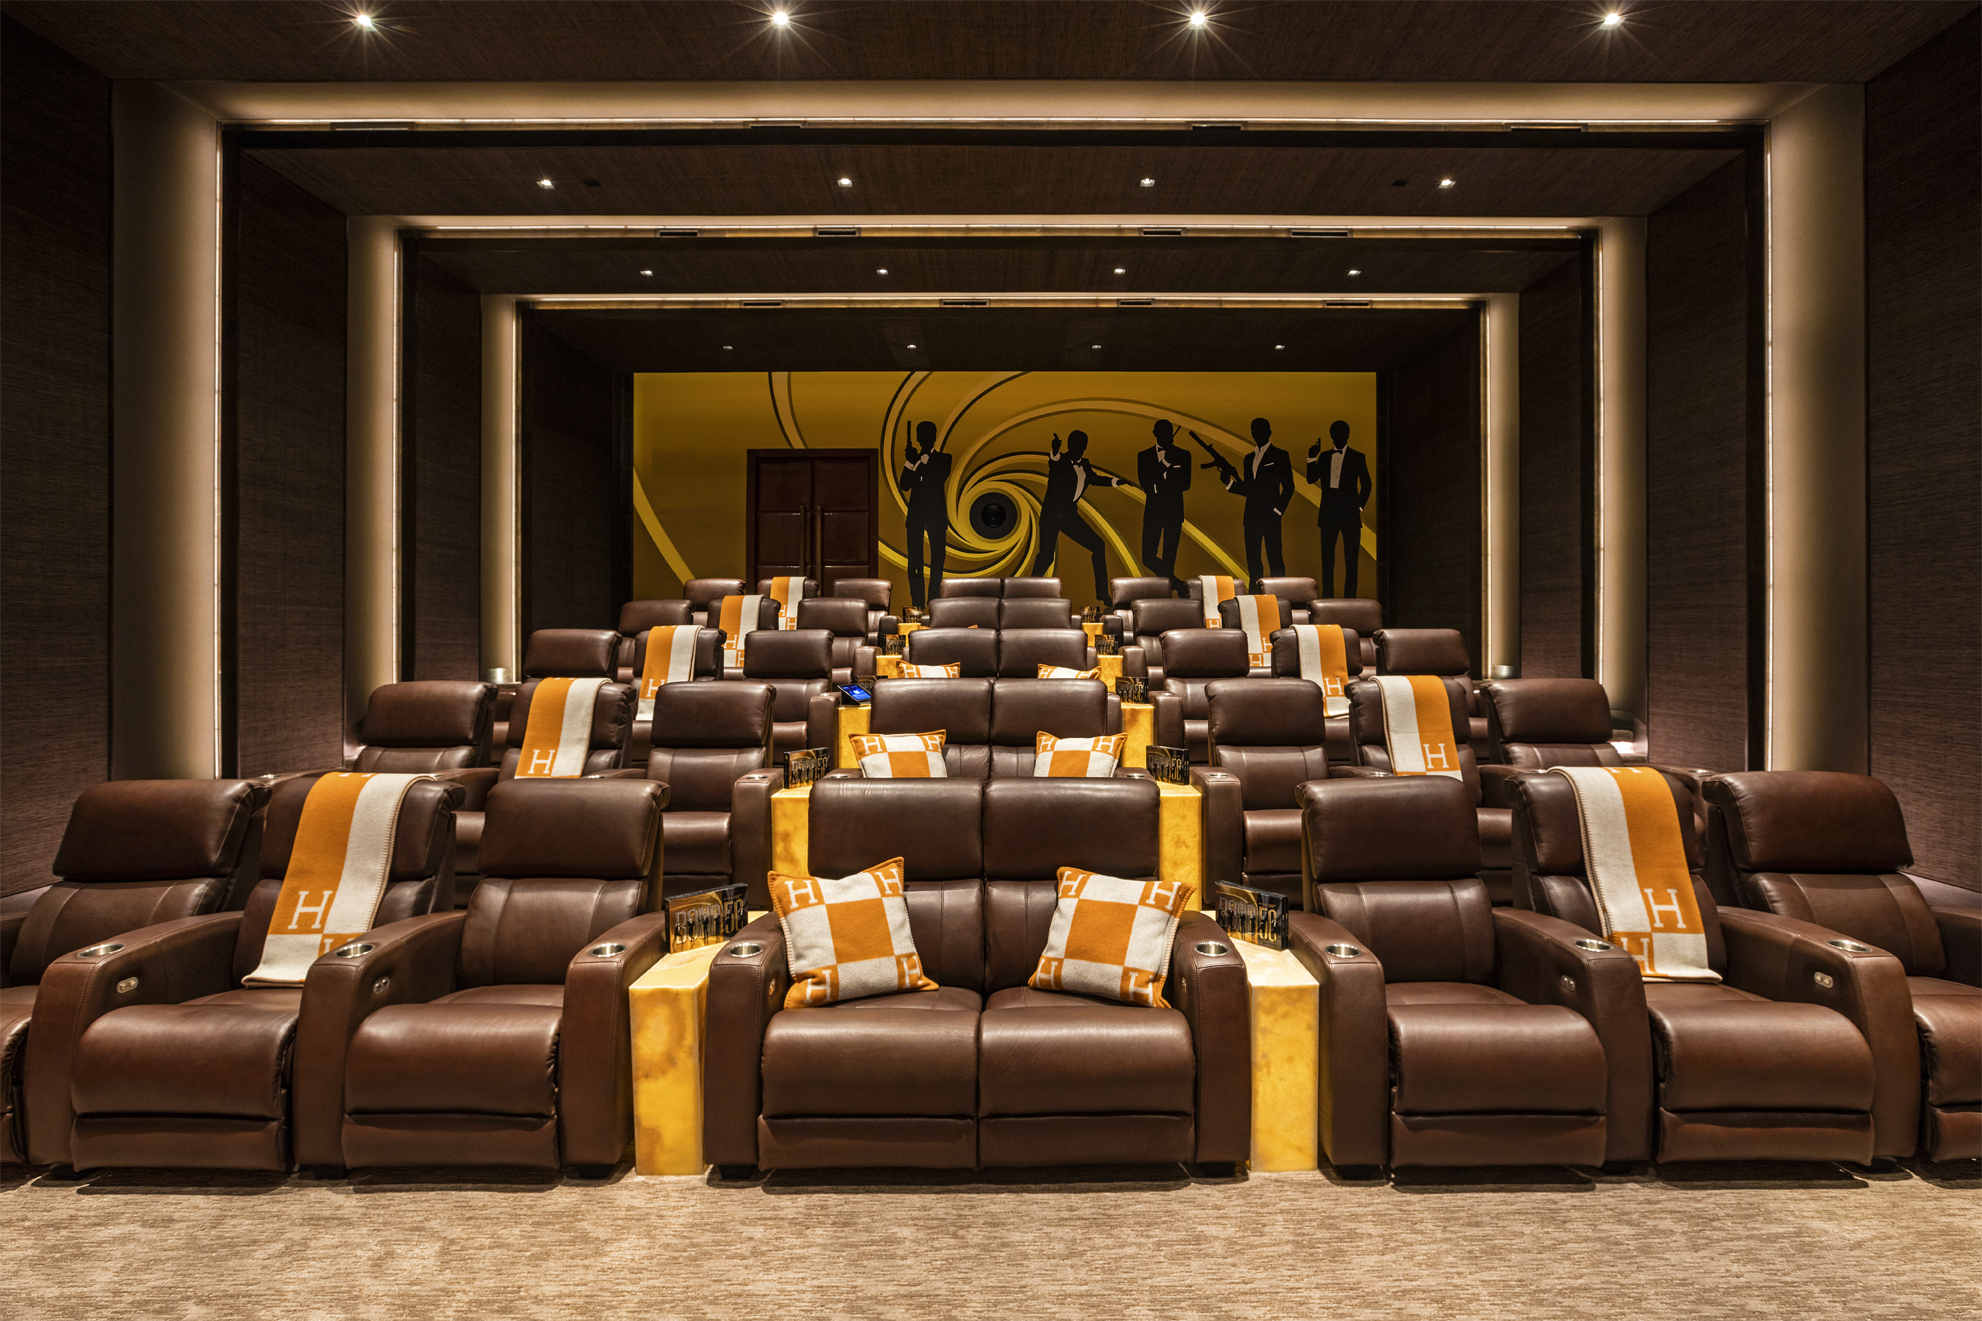 08.MovieTheater-